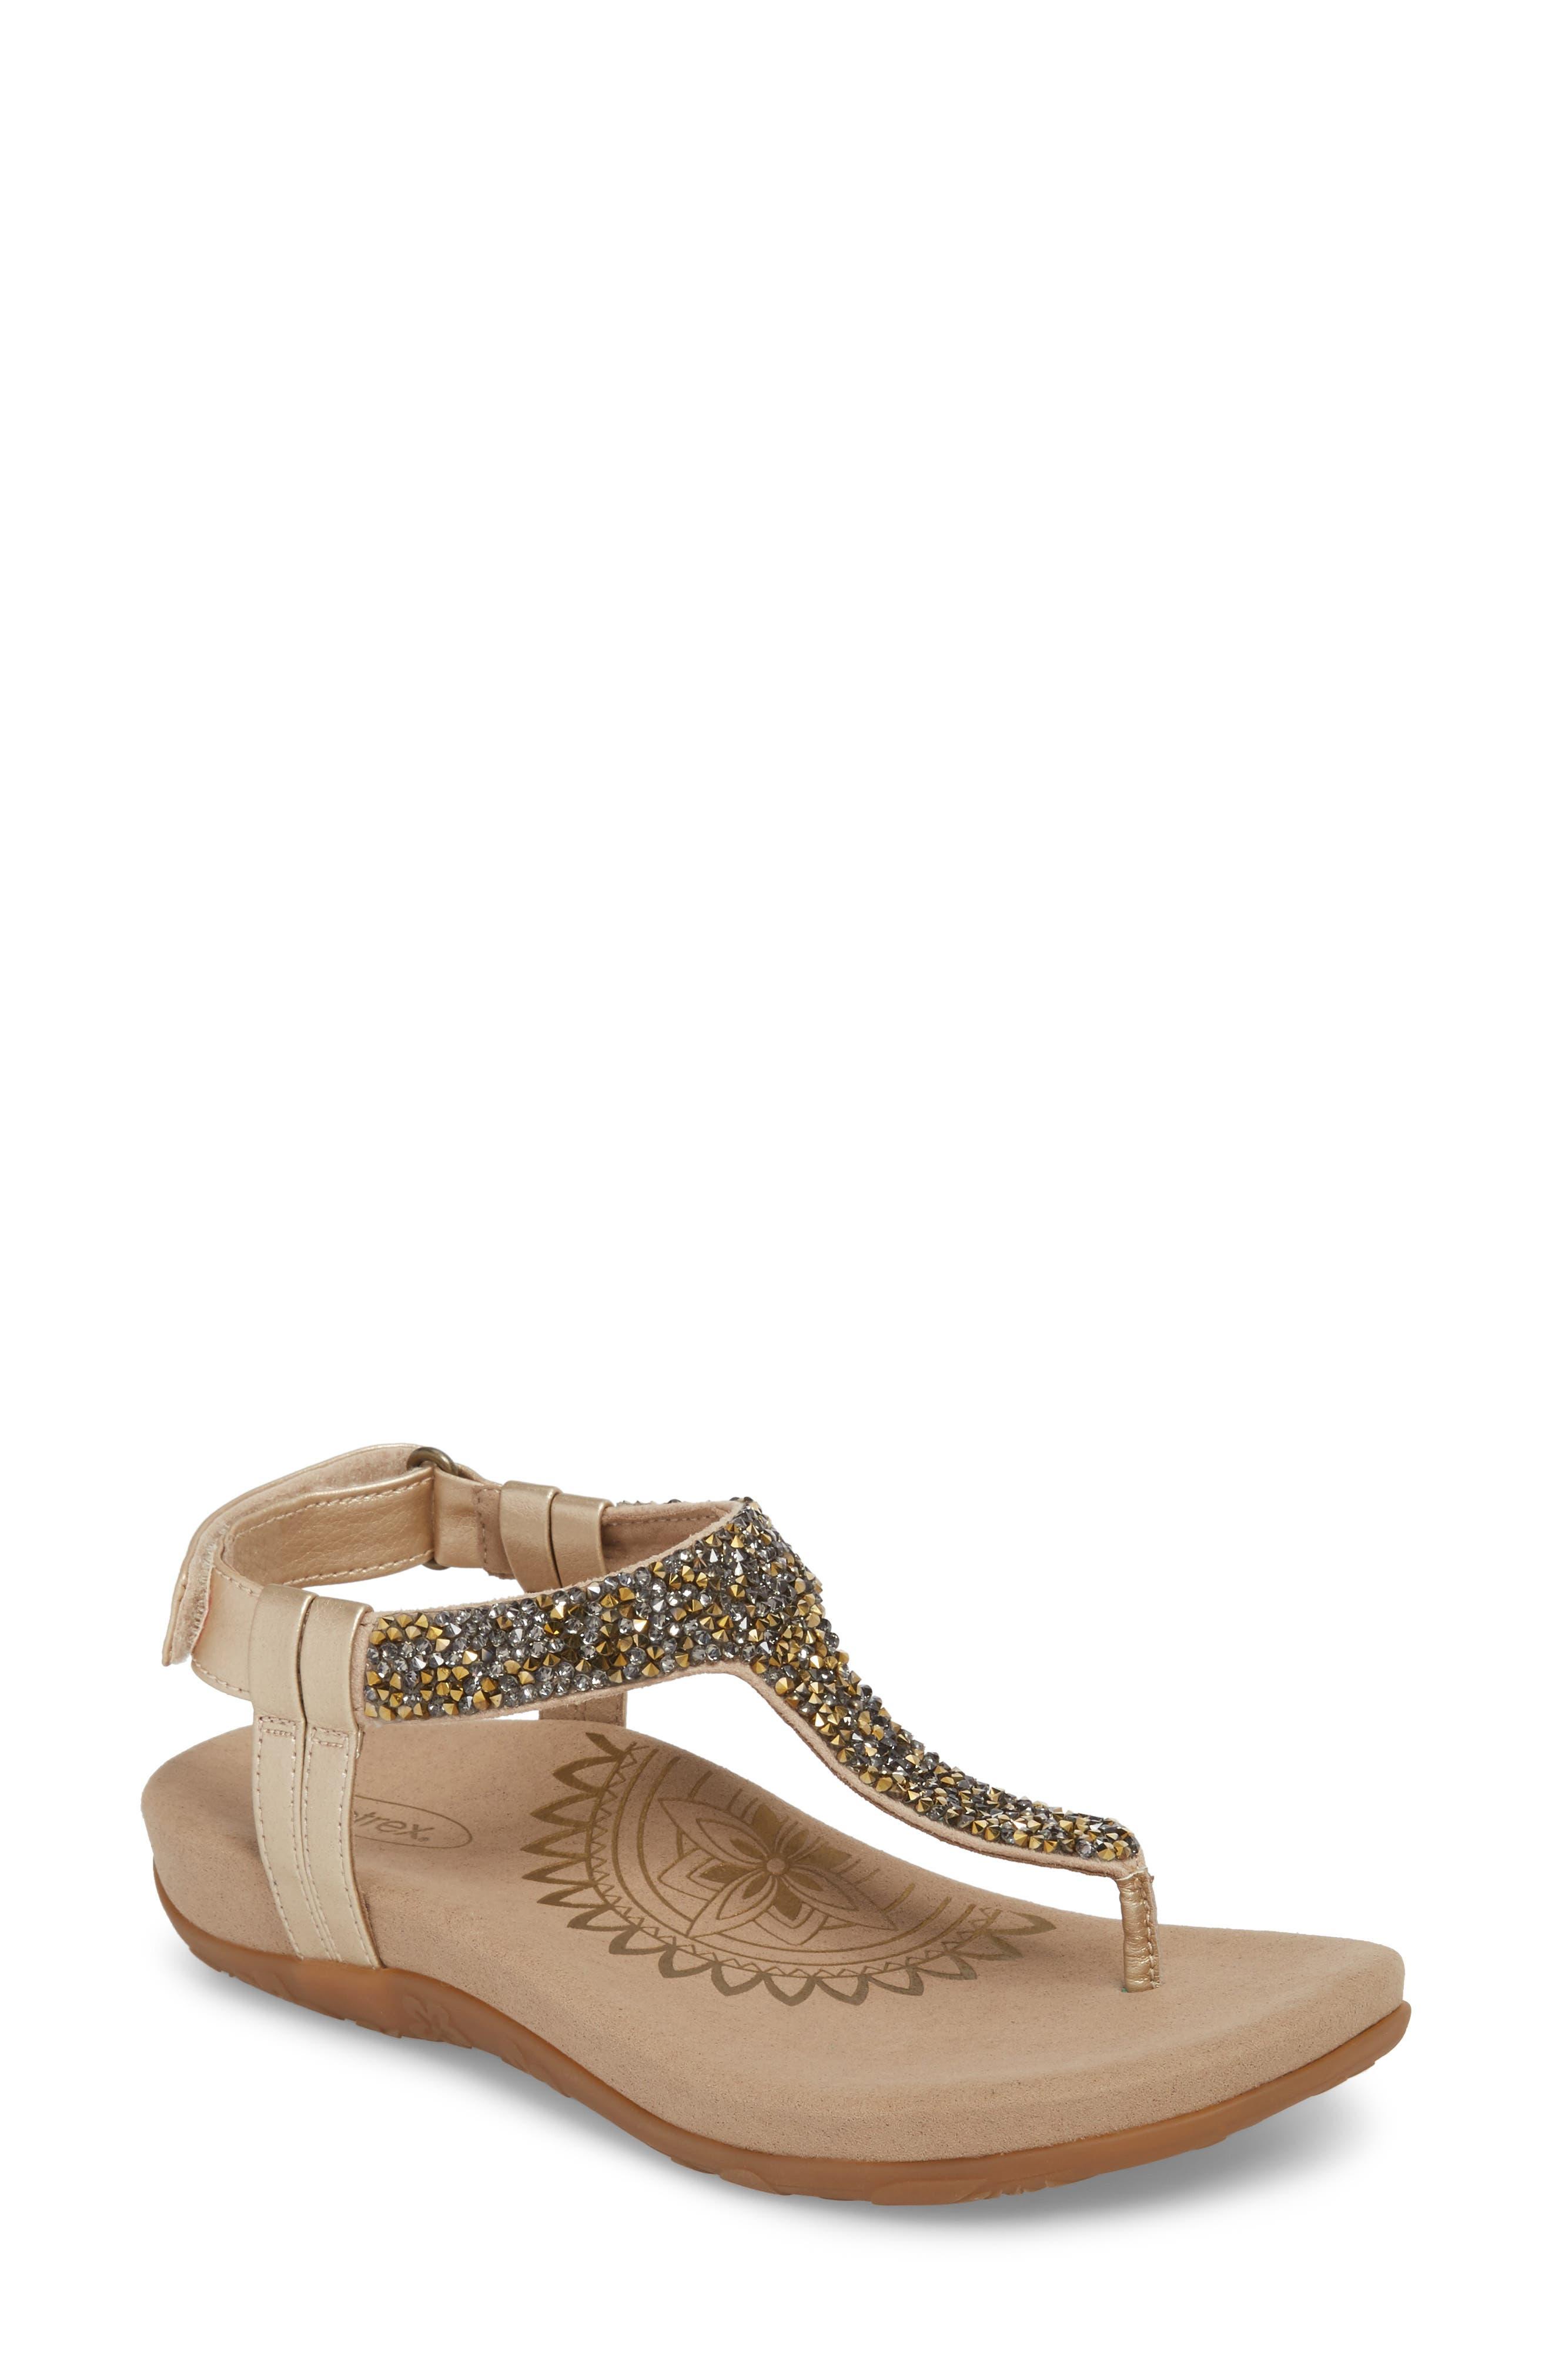 Aetrex Jade Embellished T-Strap Sandal (Women)